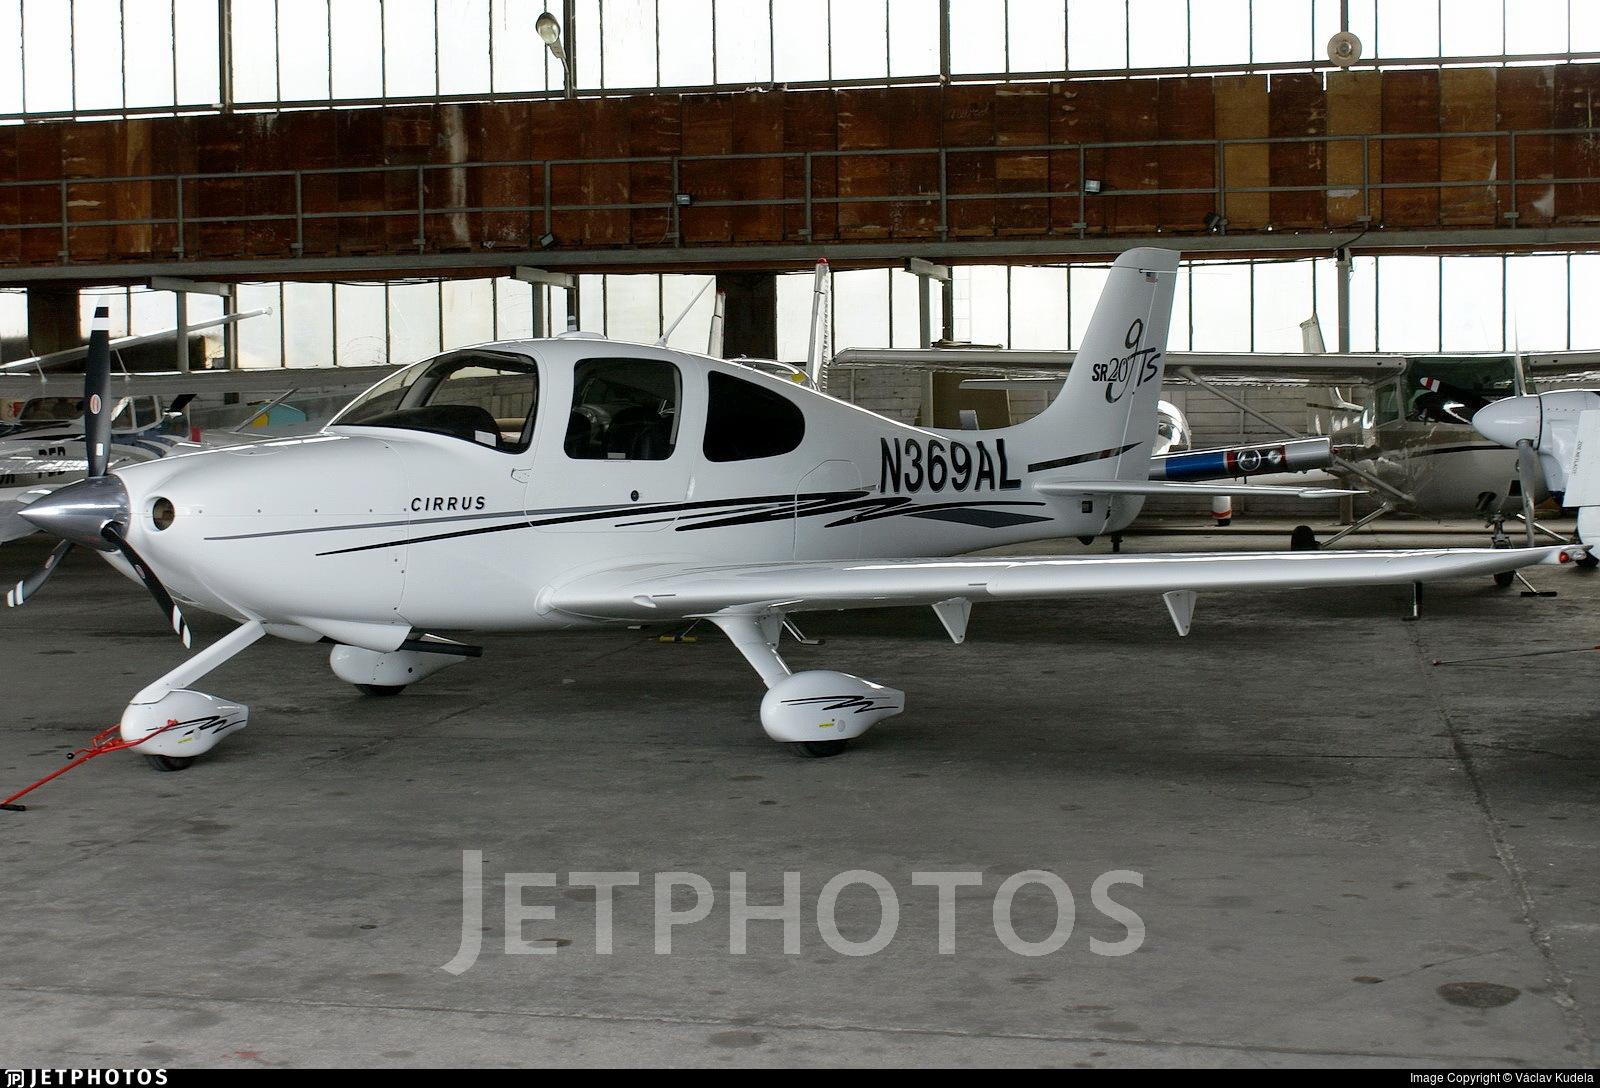 N369AL - Cirrus SR20-GTS - Private